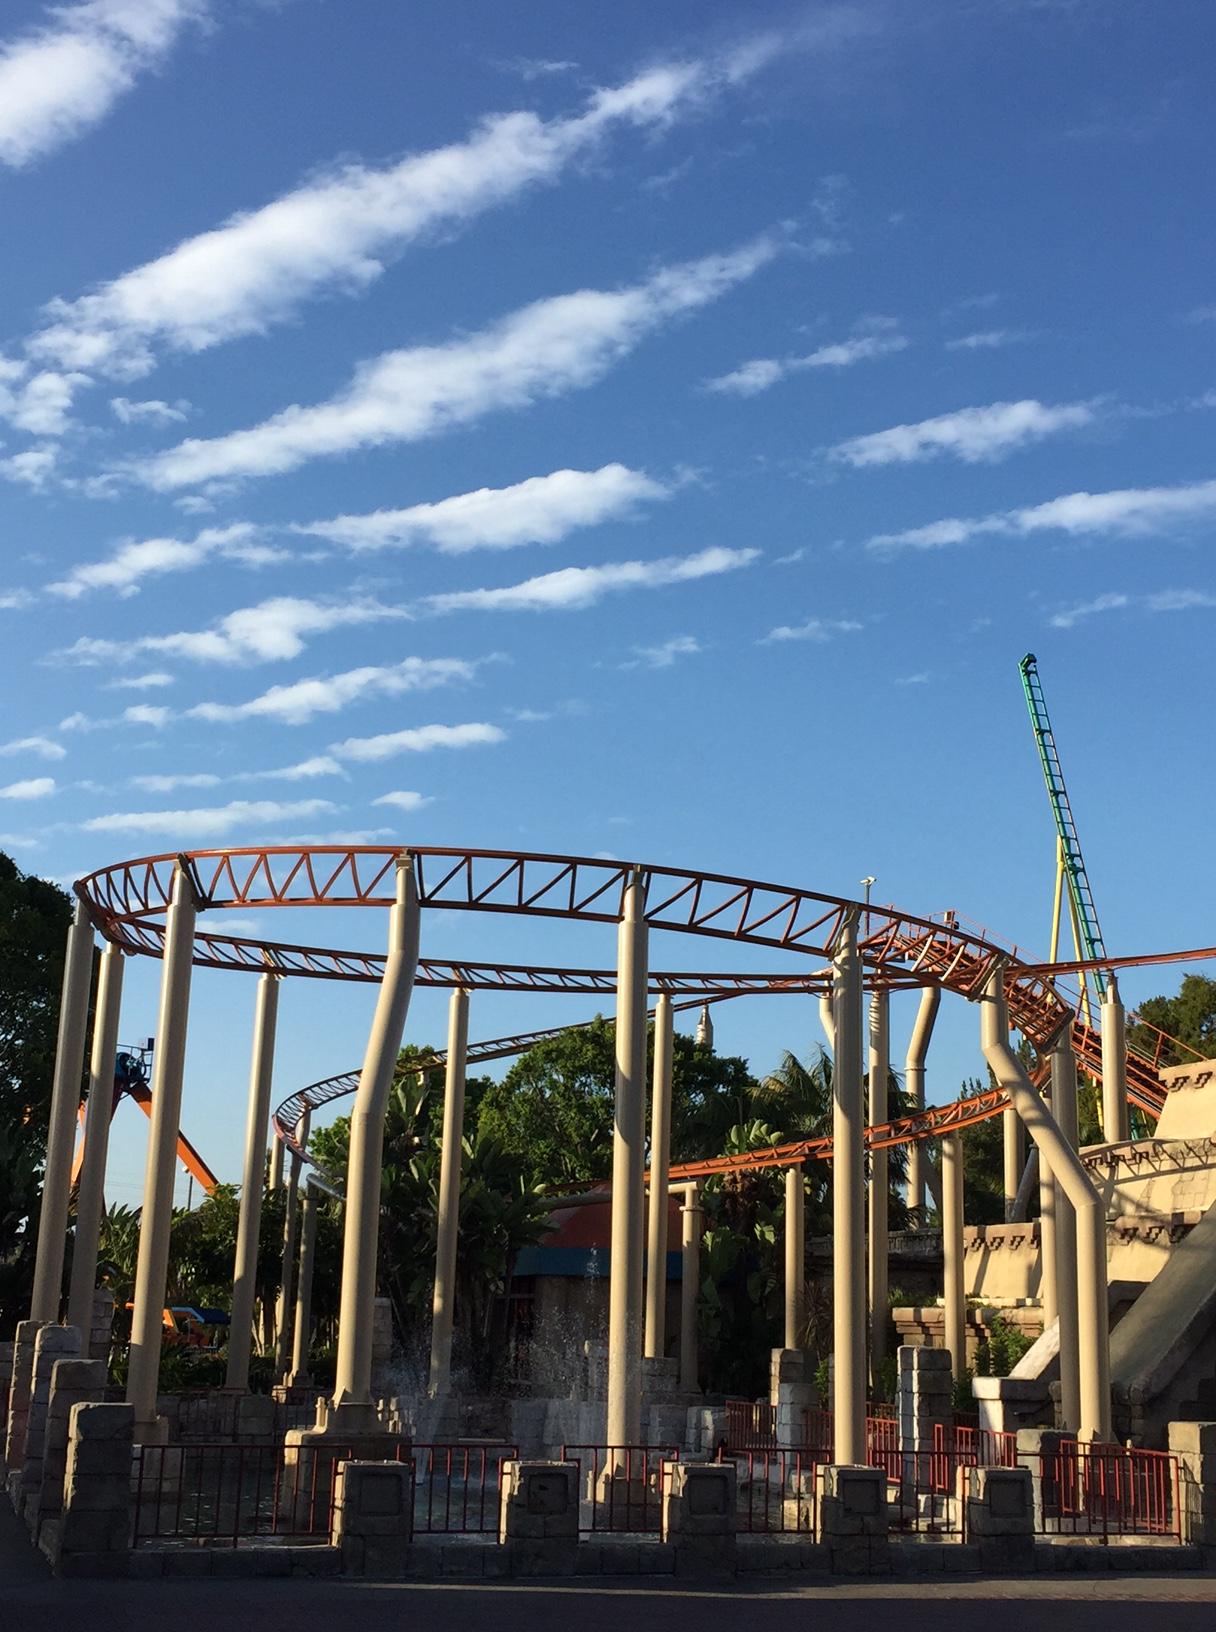 jaguar roller coaster - photo #18